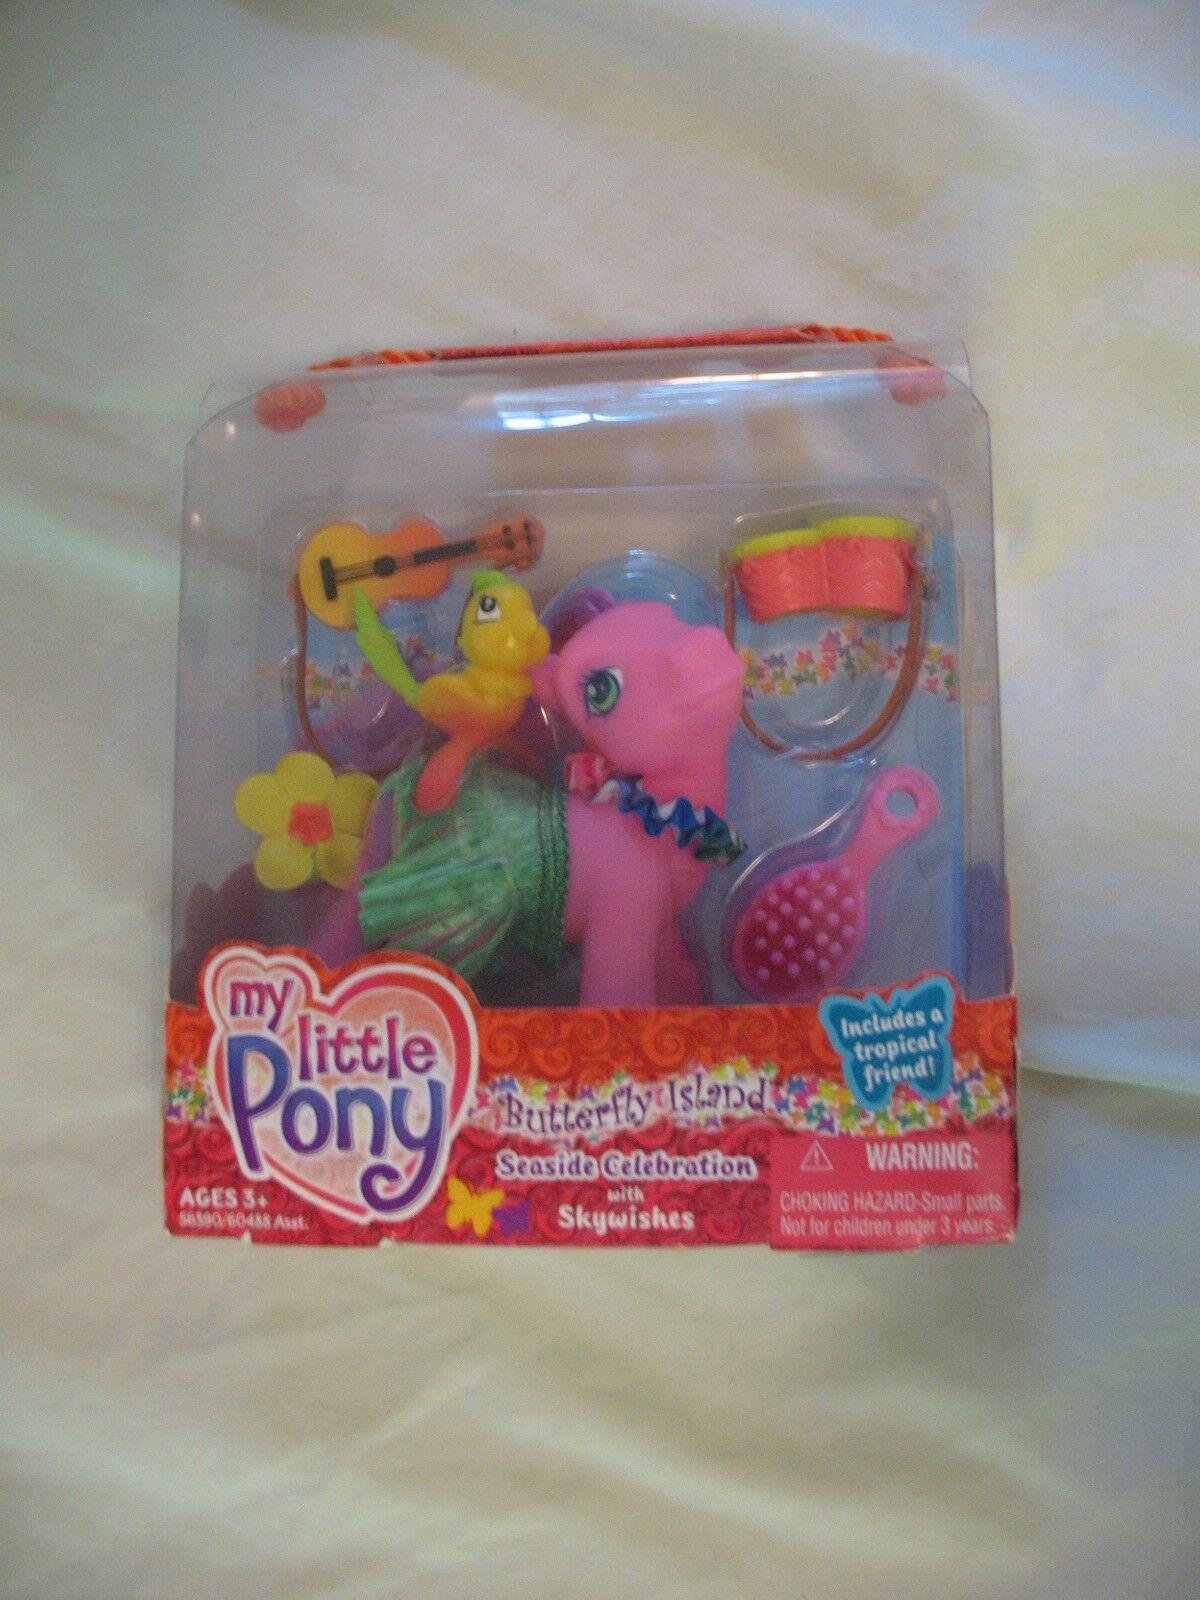 My Little Pony 'Sky Wishes' Butterfly Island - - - Seaside Celebration Set 2004 G3 b8e066